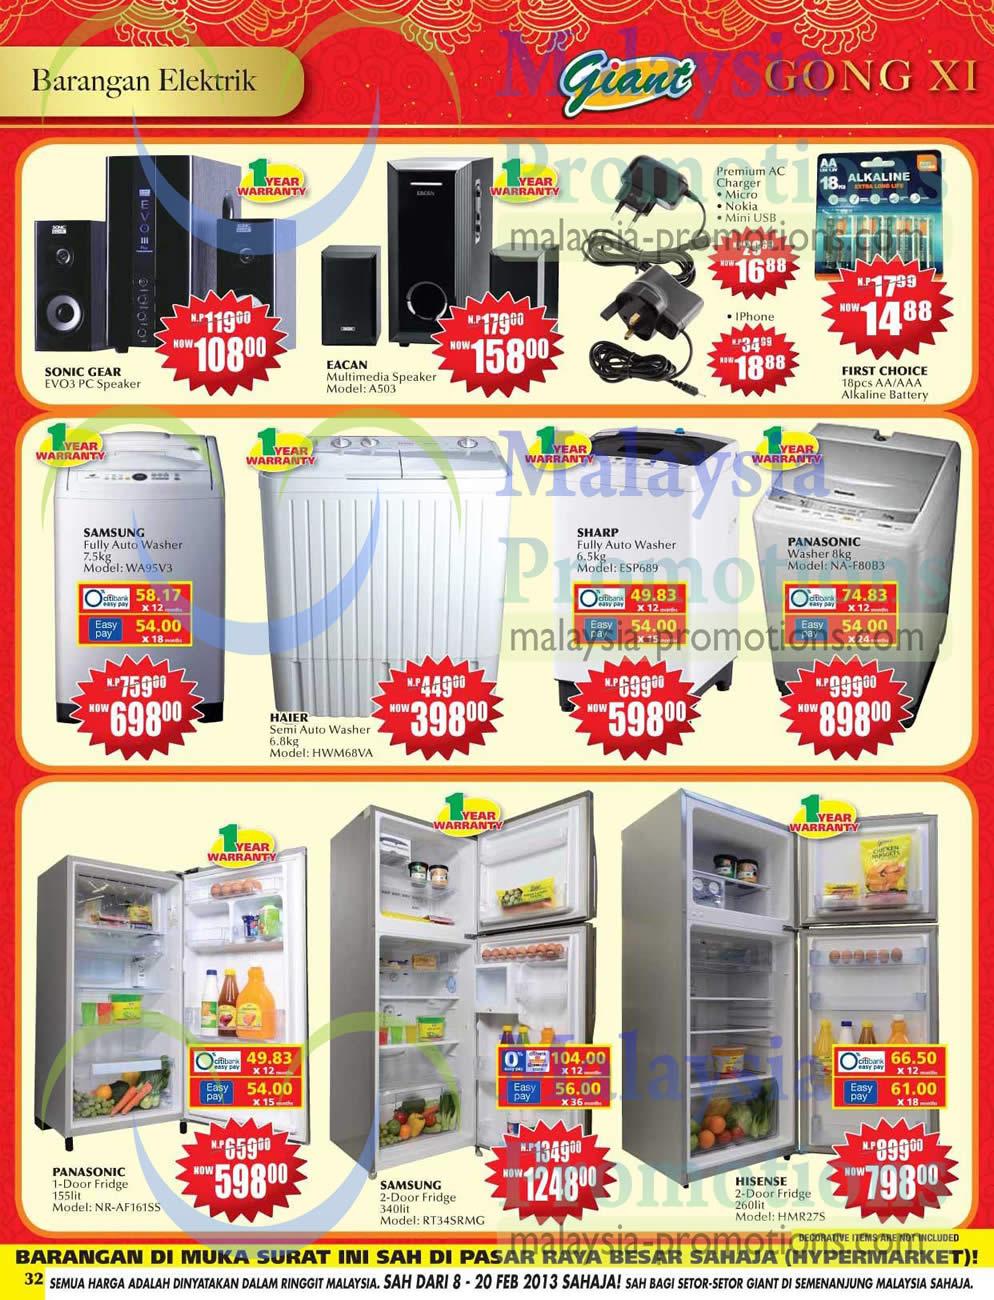 Washers, Fridges, Speakers, Panasonic, Samsung, Hisense